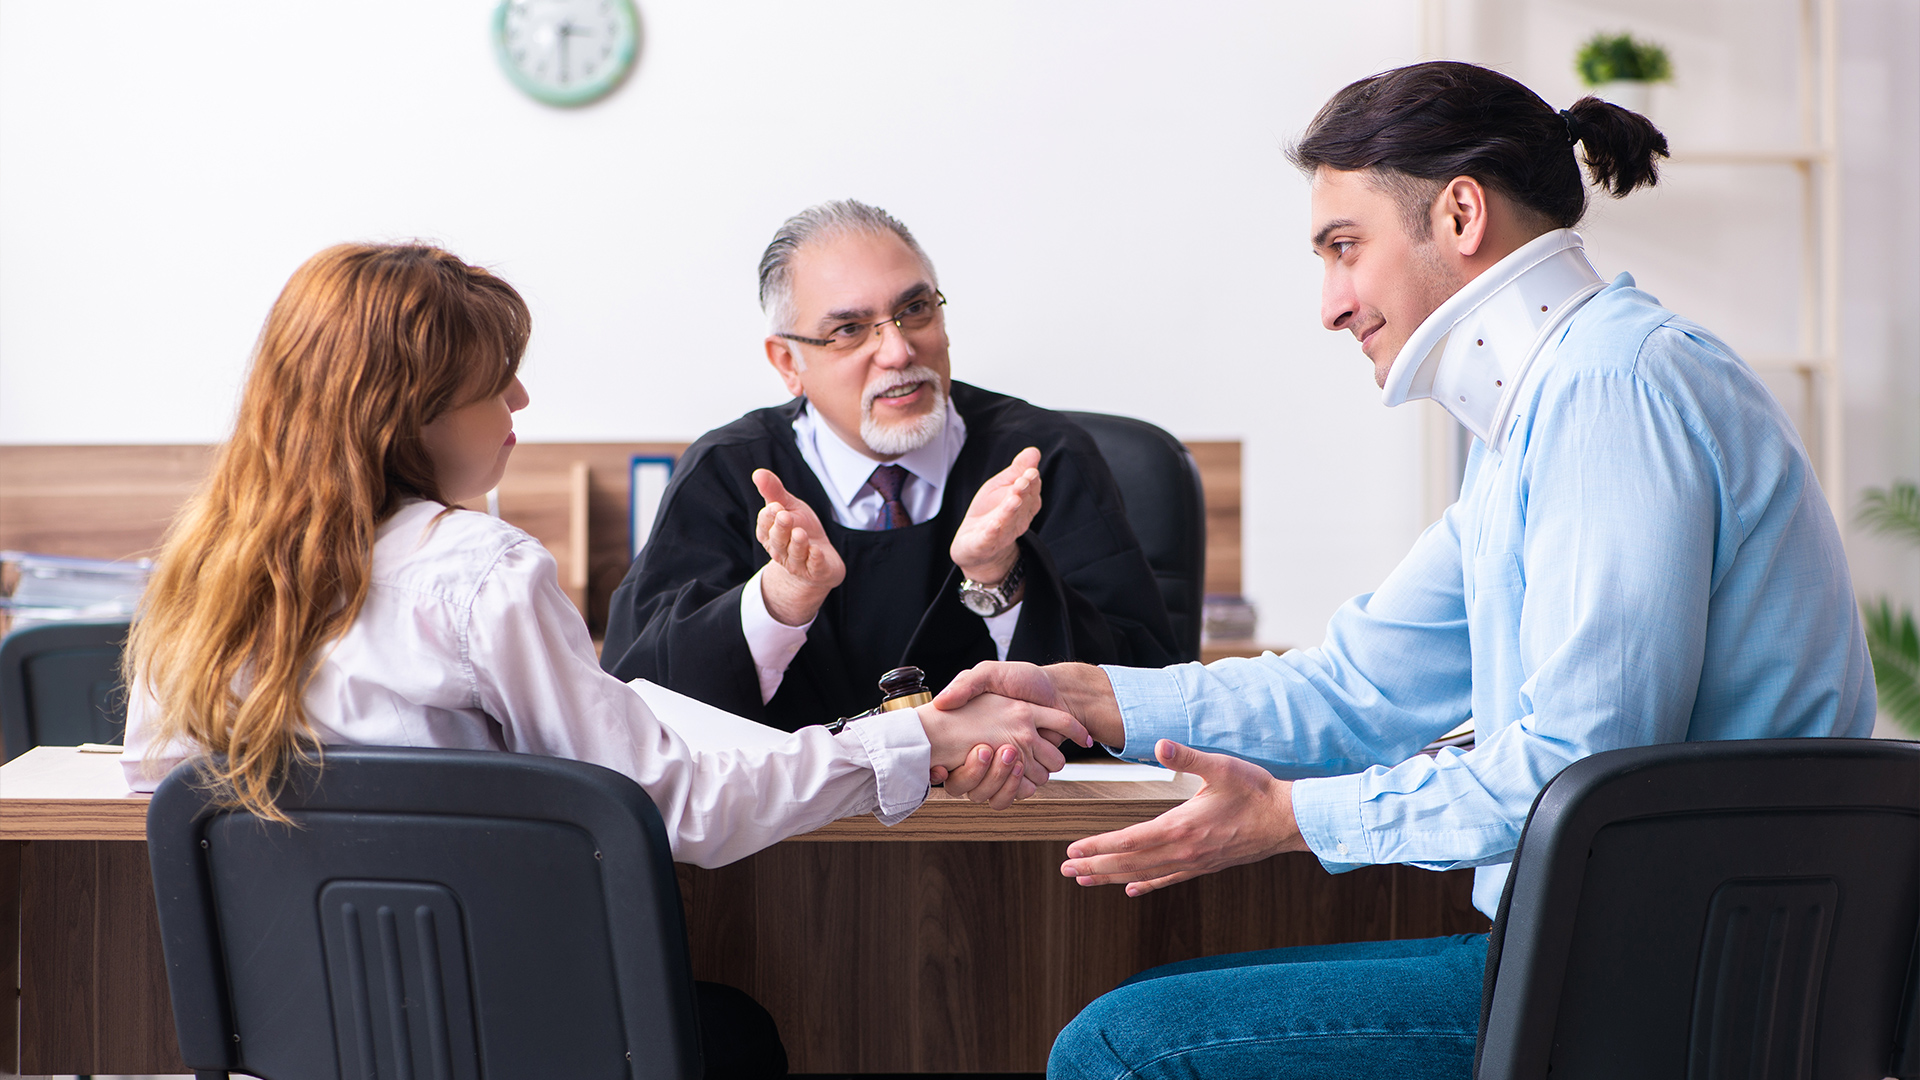 assicurazione spese legali stragiudiziali